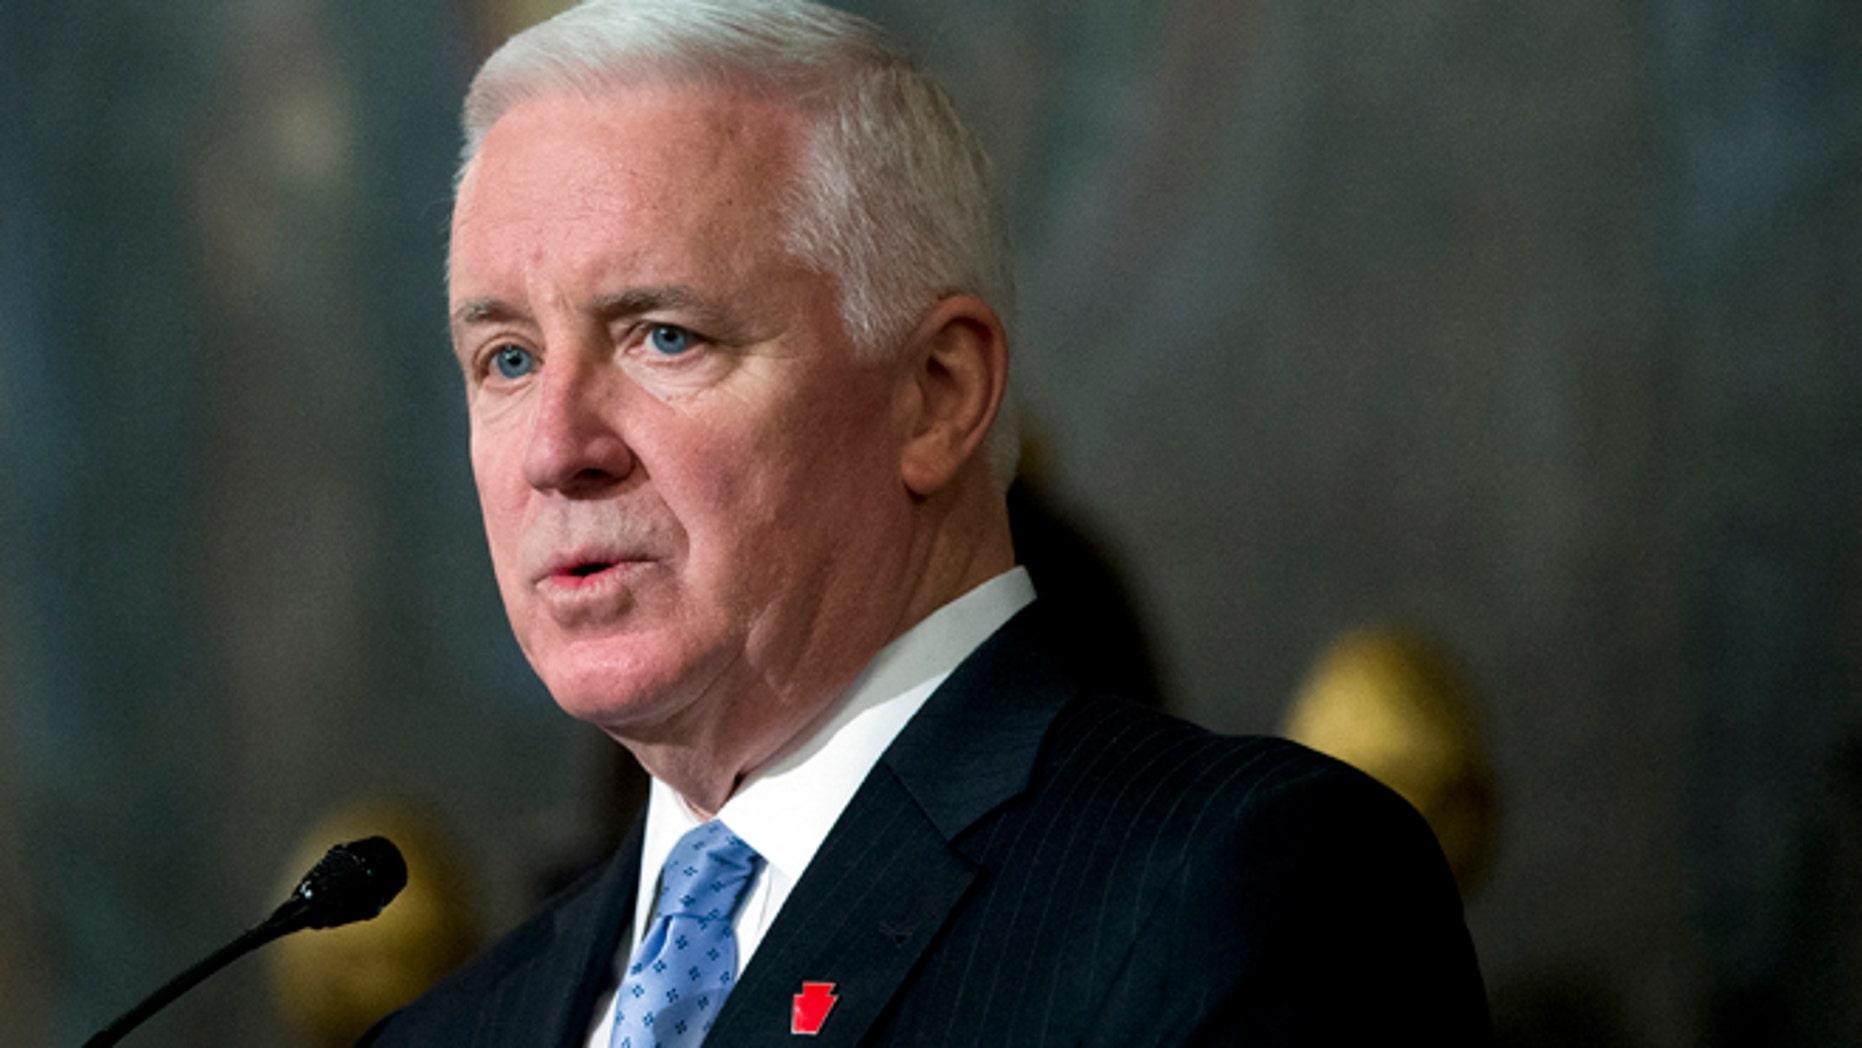 Feb. 4, 2014: Republican Pennsylvania Gov. Tom Corbett speaks in Harrisburg, Pa.